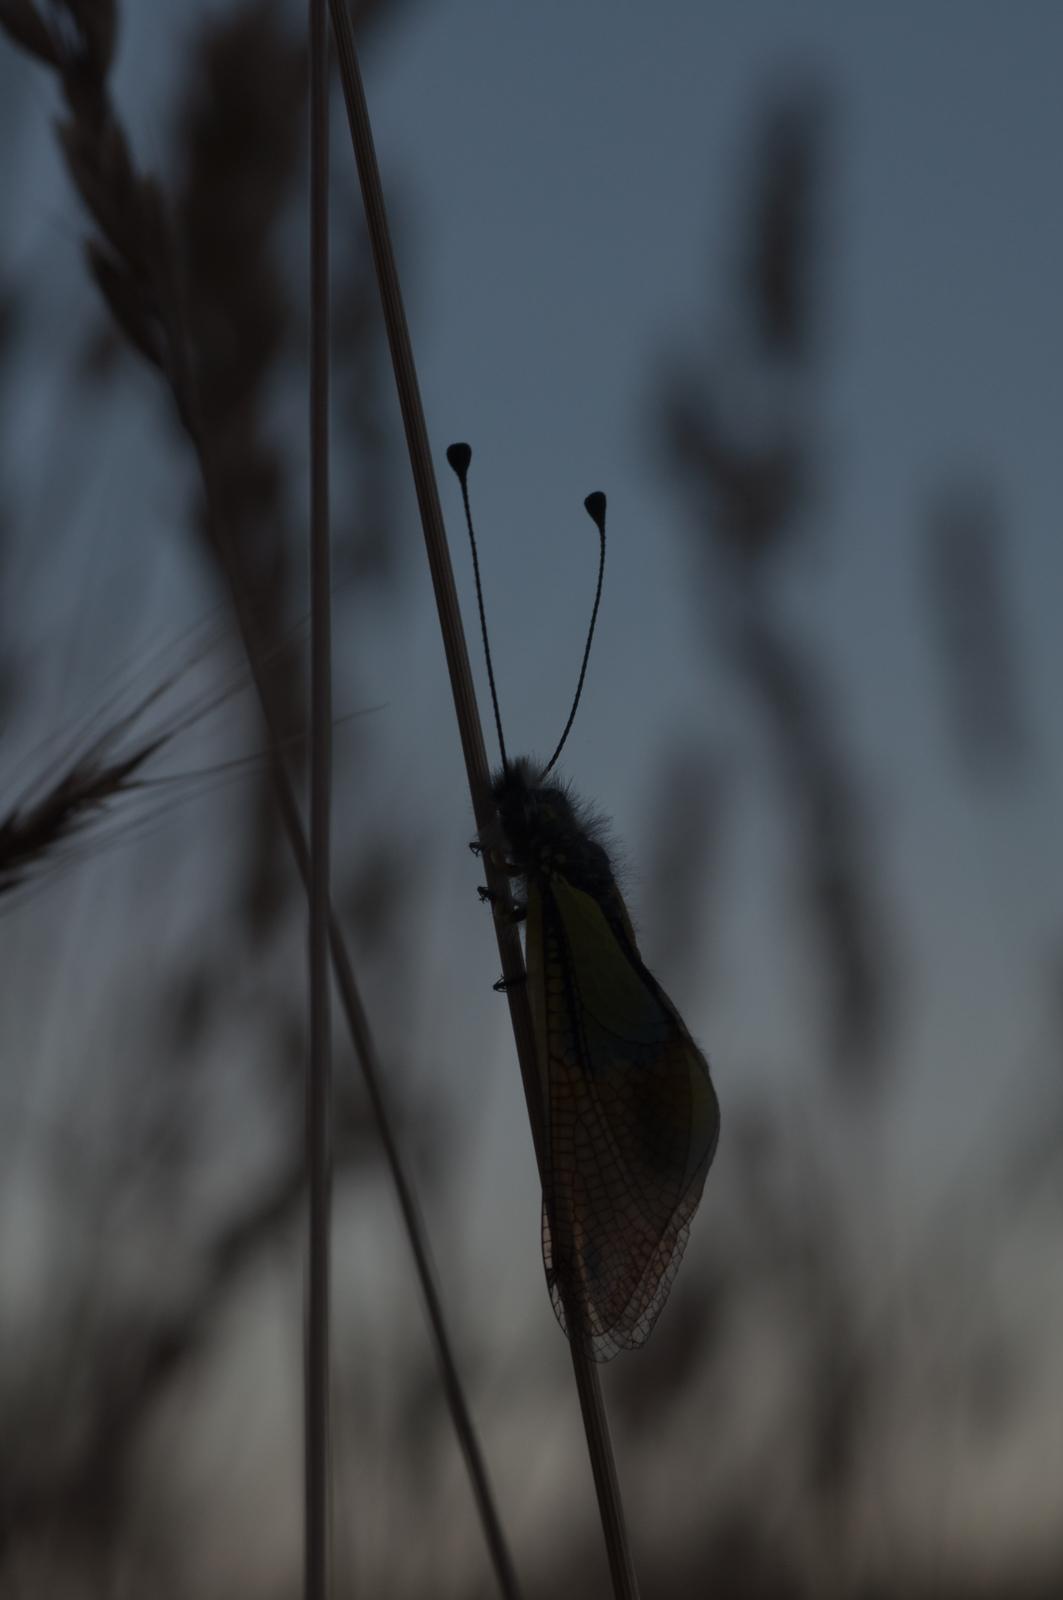 Libelloide baeticus